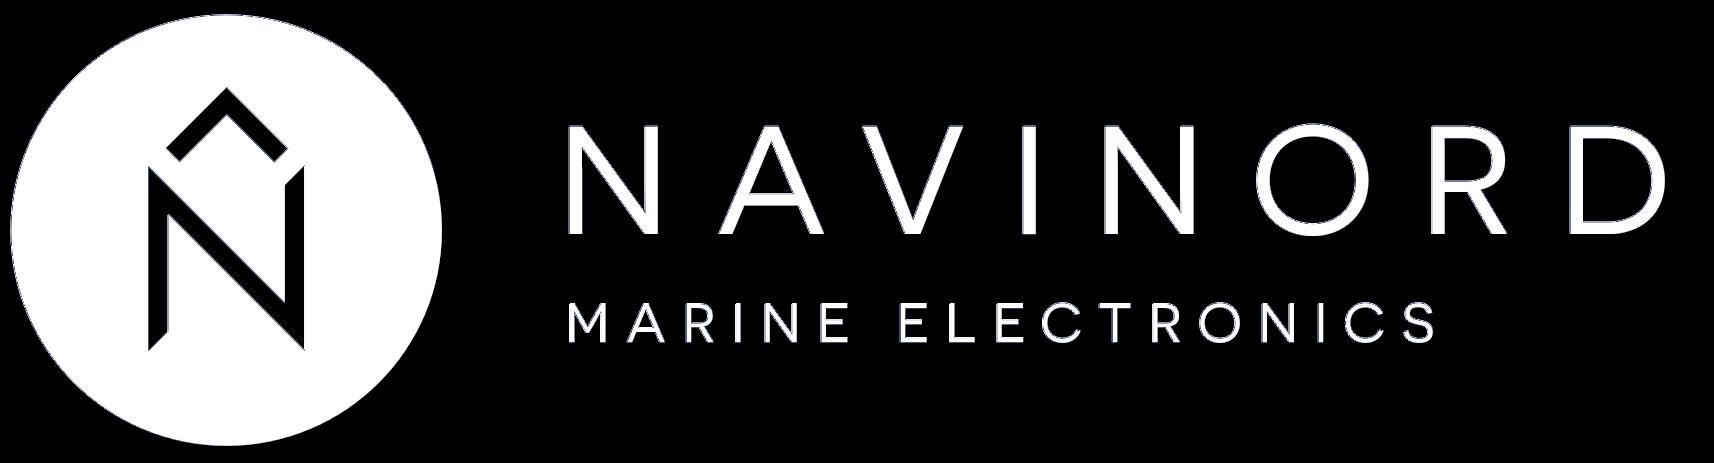 NAVINORD.COM